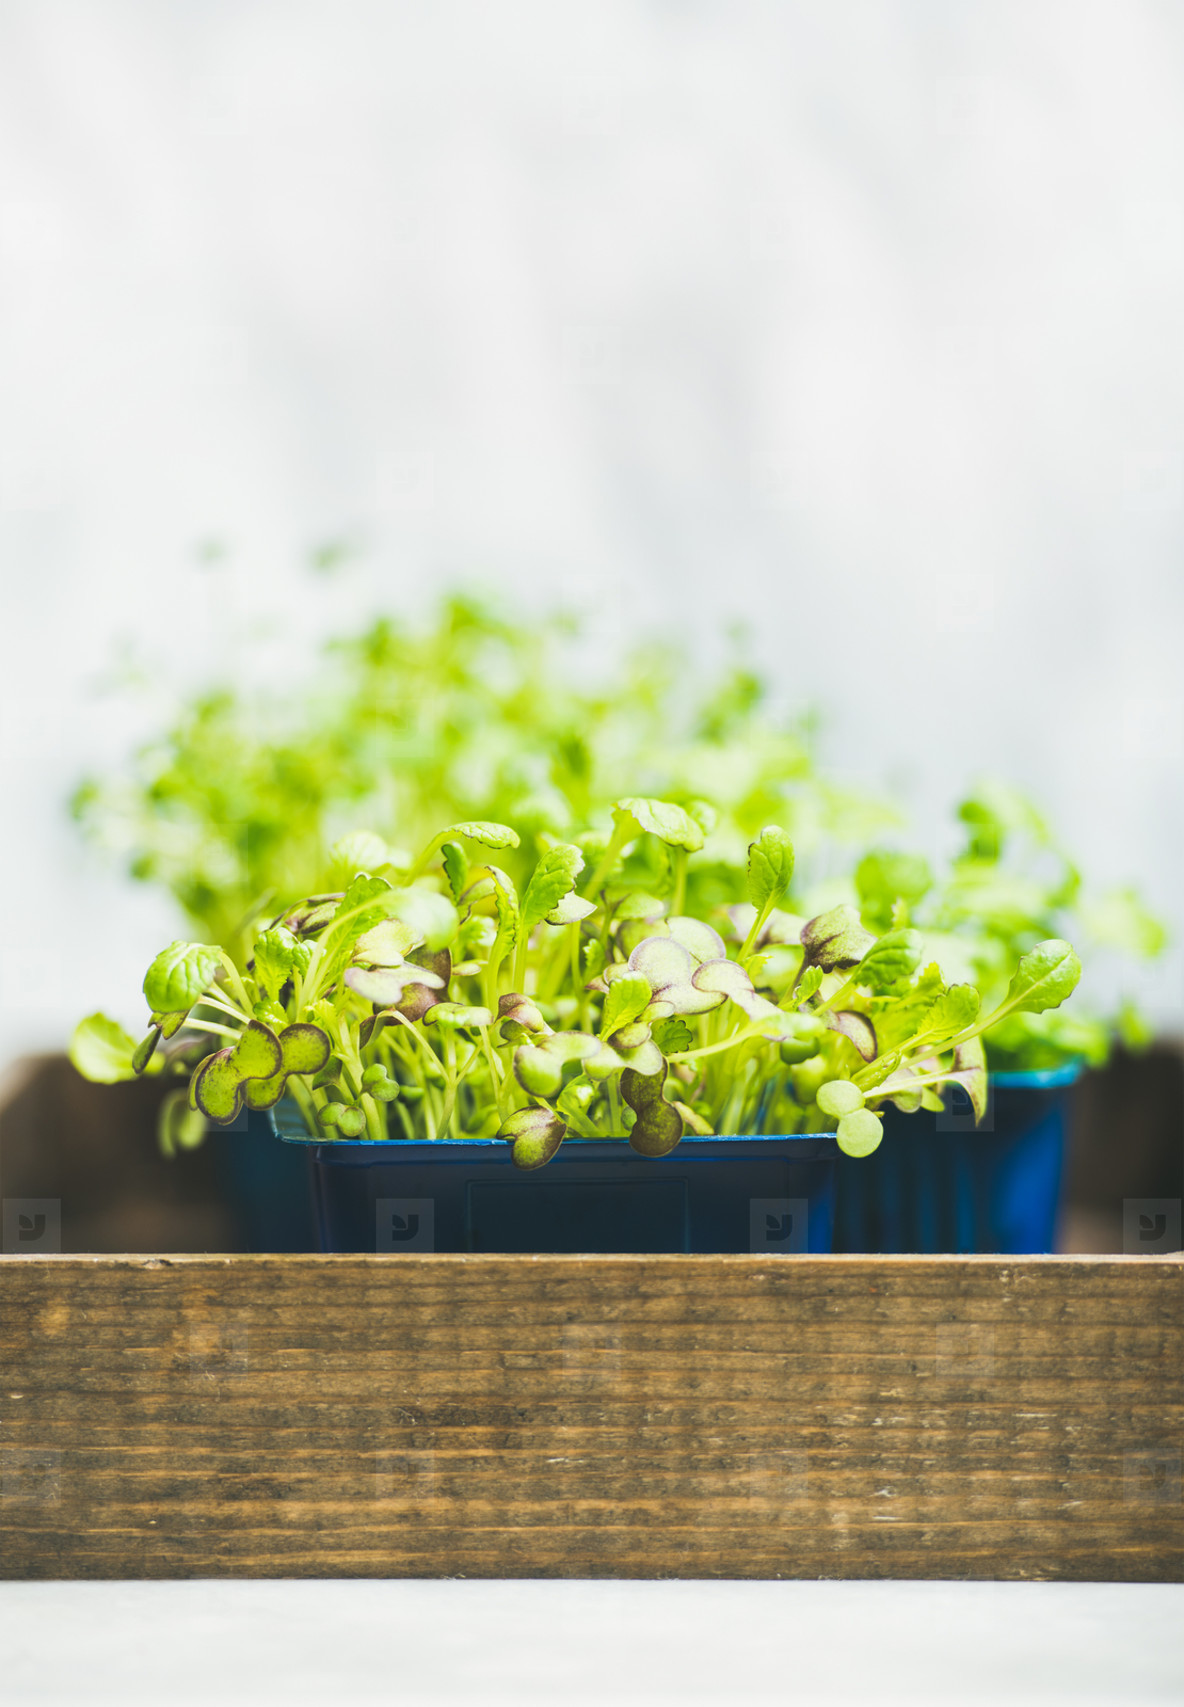 Fresh spring green live radish kress sprouts on wooden box